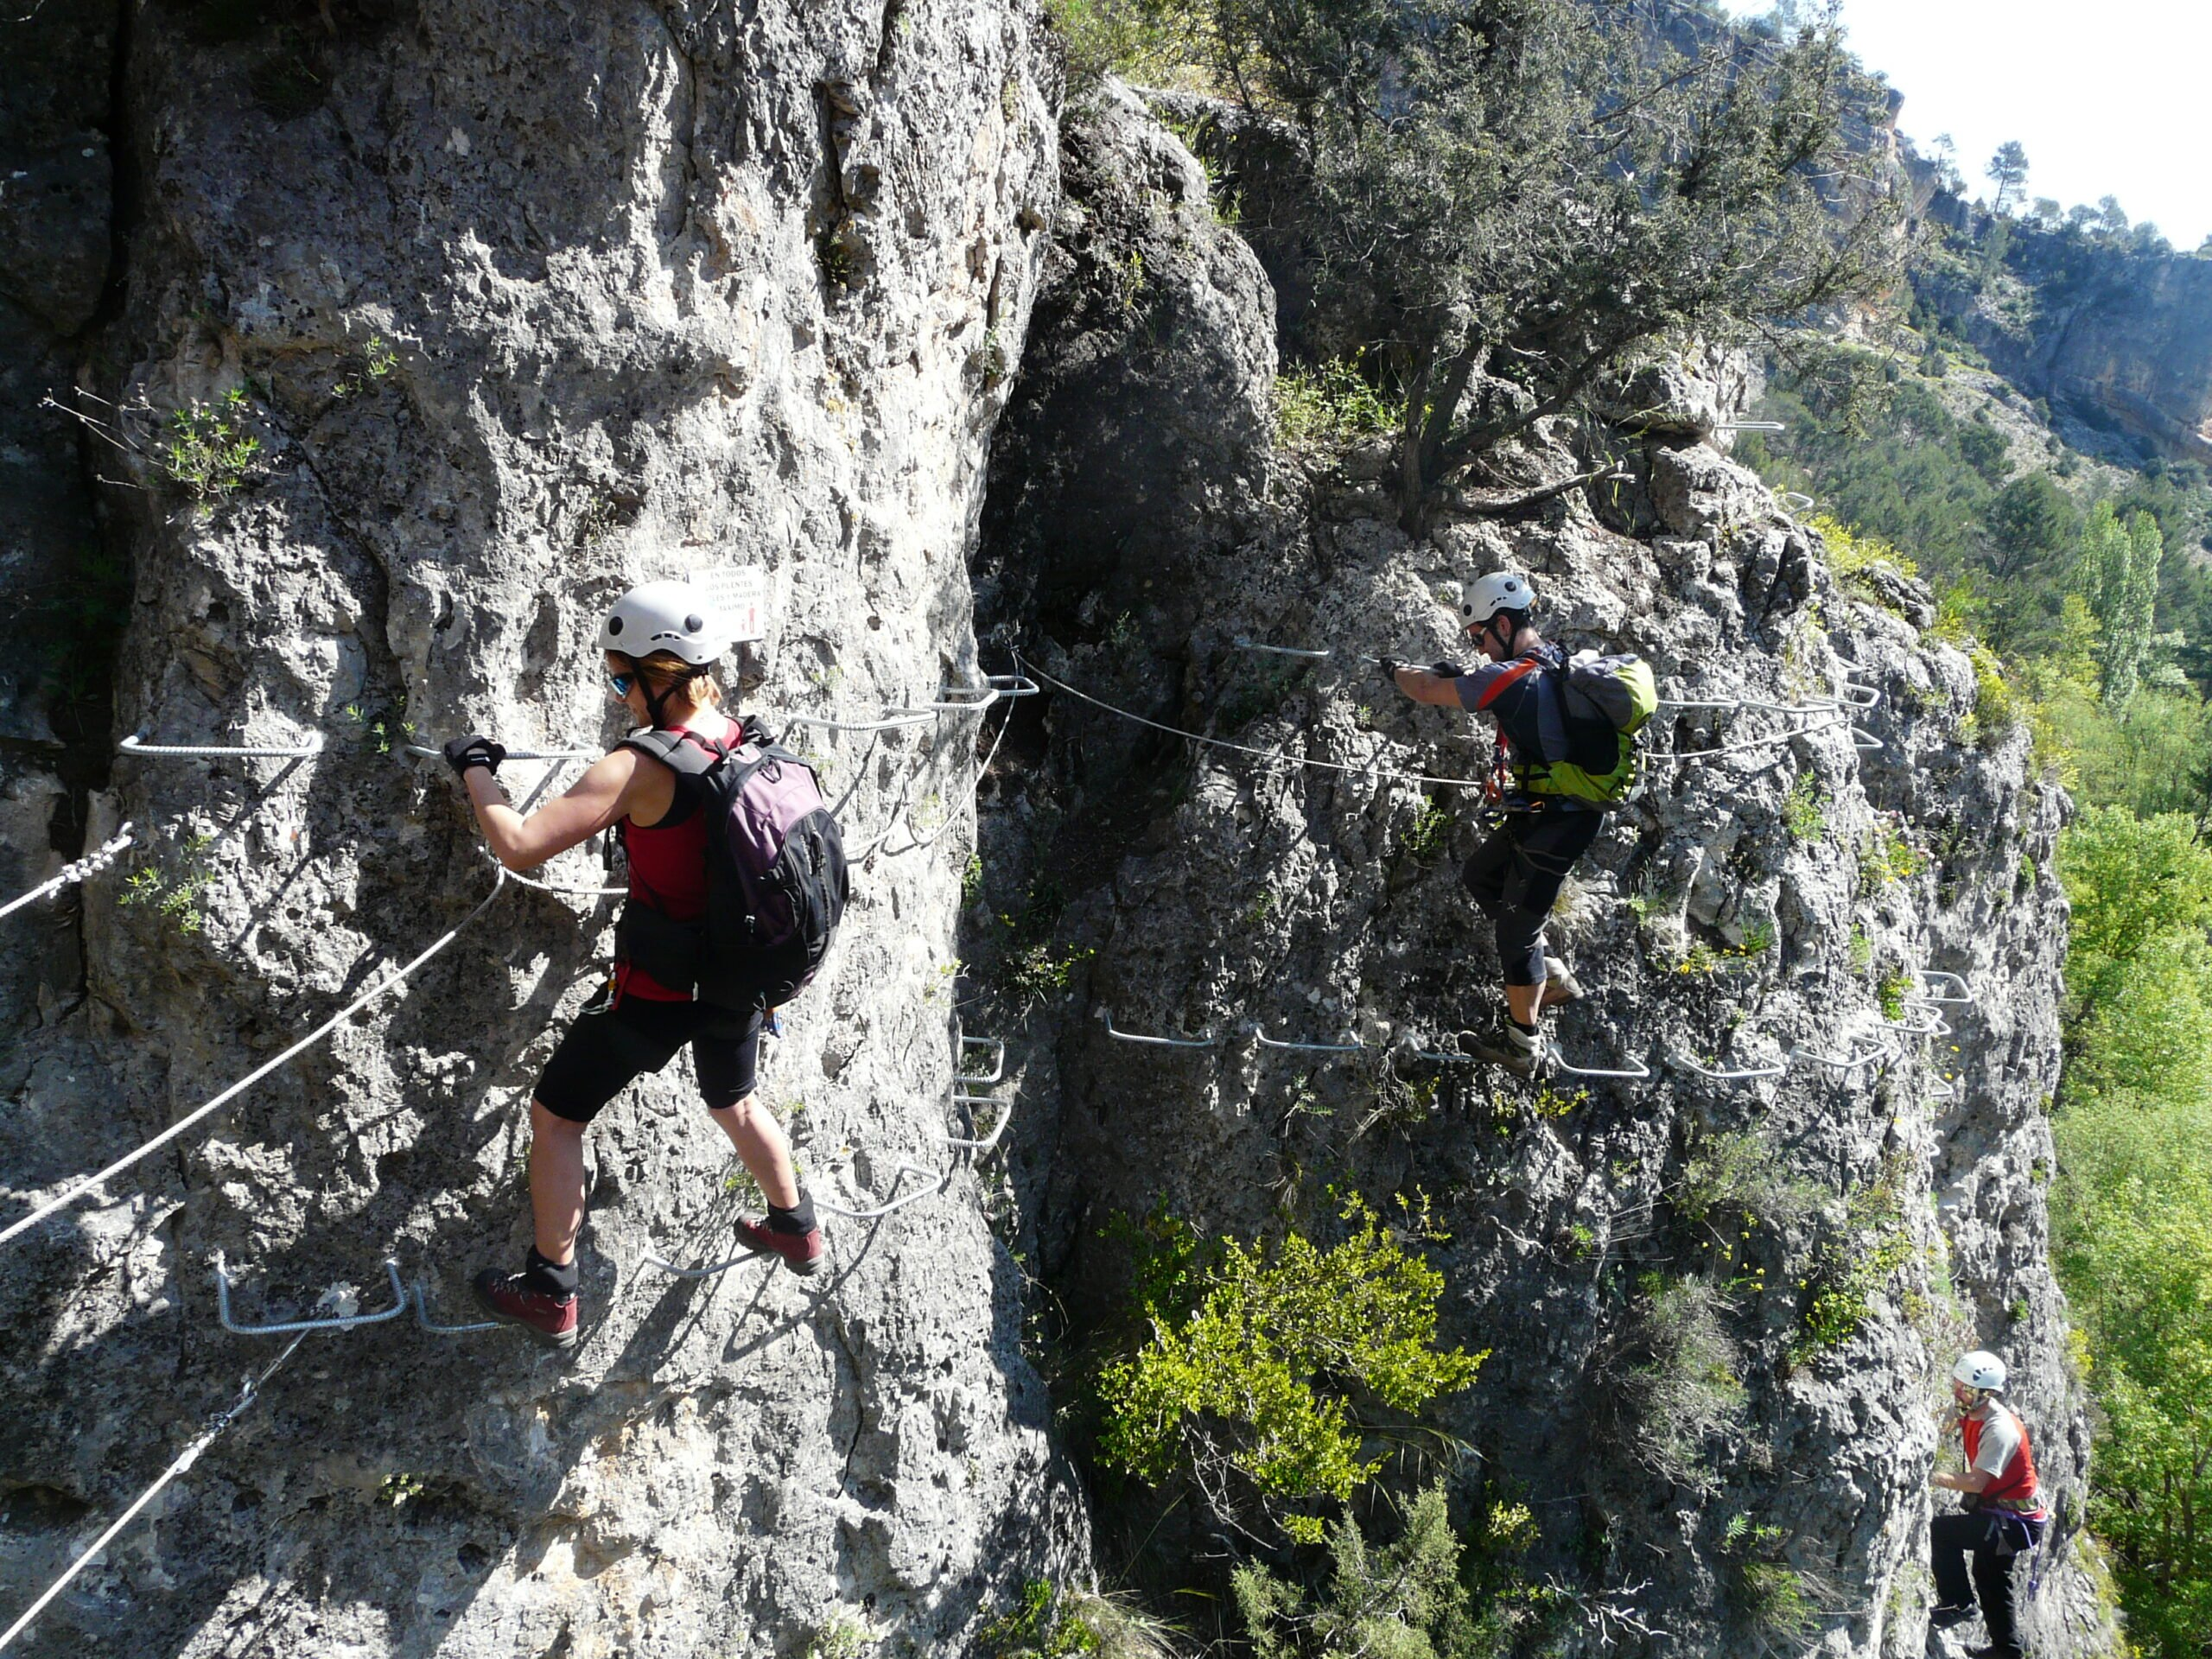 Discover Hoz De Priego In Our Via Ferrata Adventure Tour In Cuenca